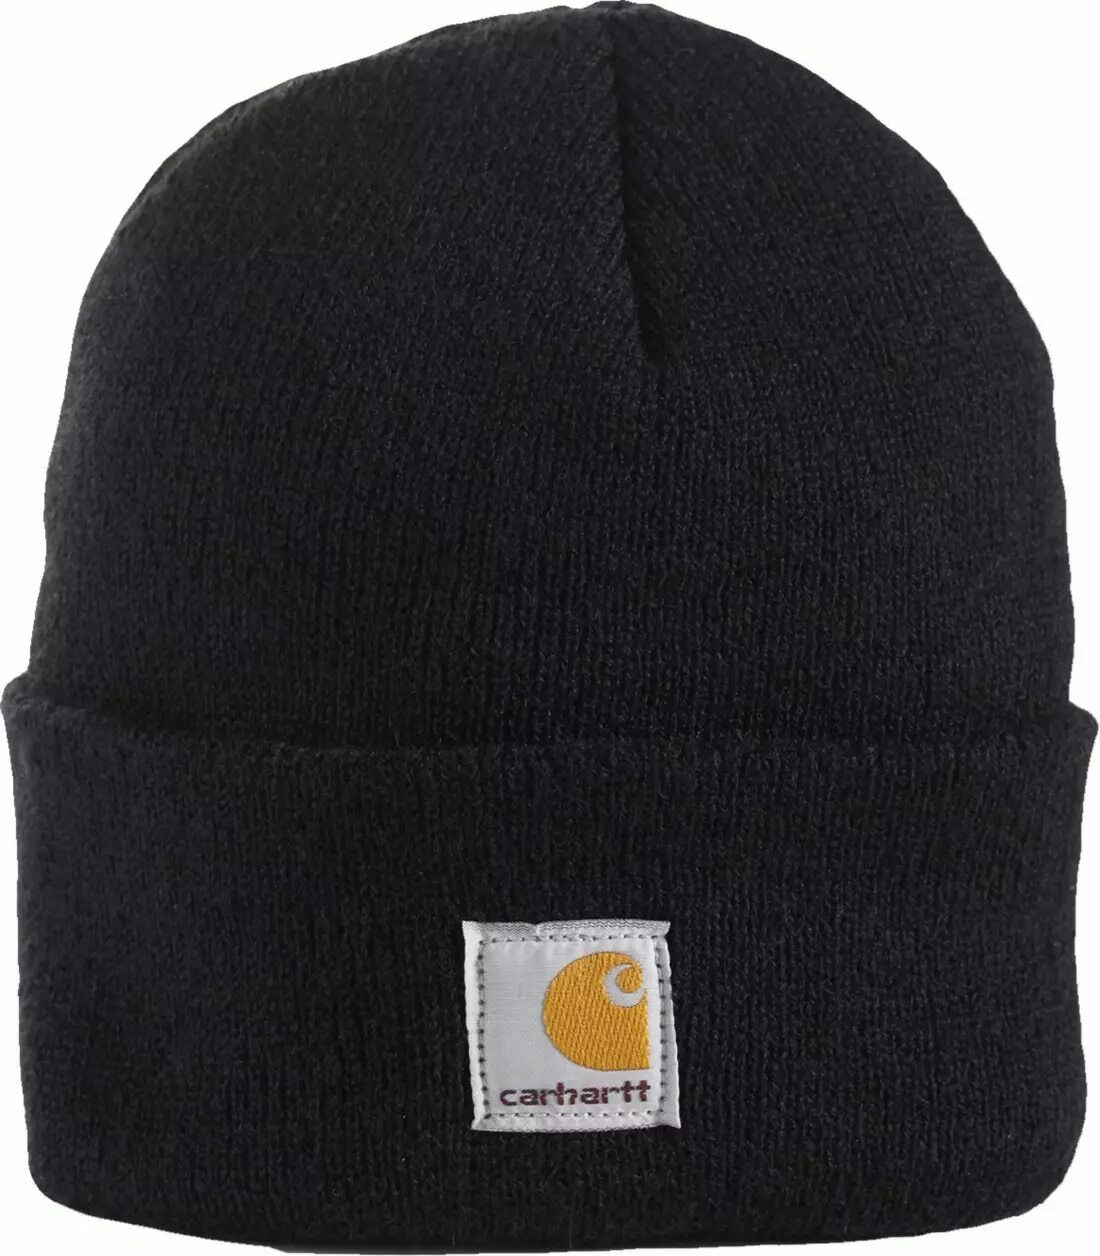 Carhartt Boys' And Girls' Acrylic Watch Hat, Carhartt Brown